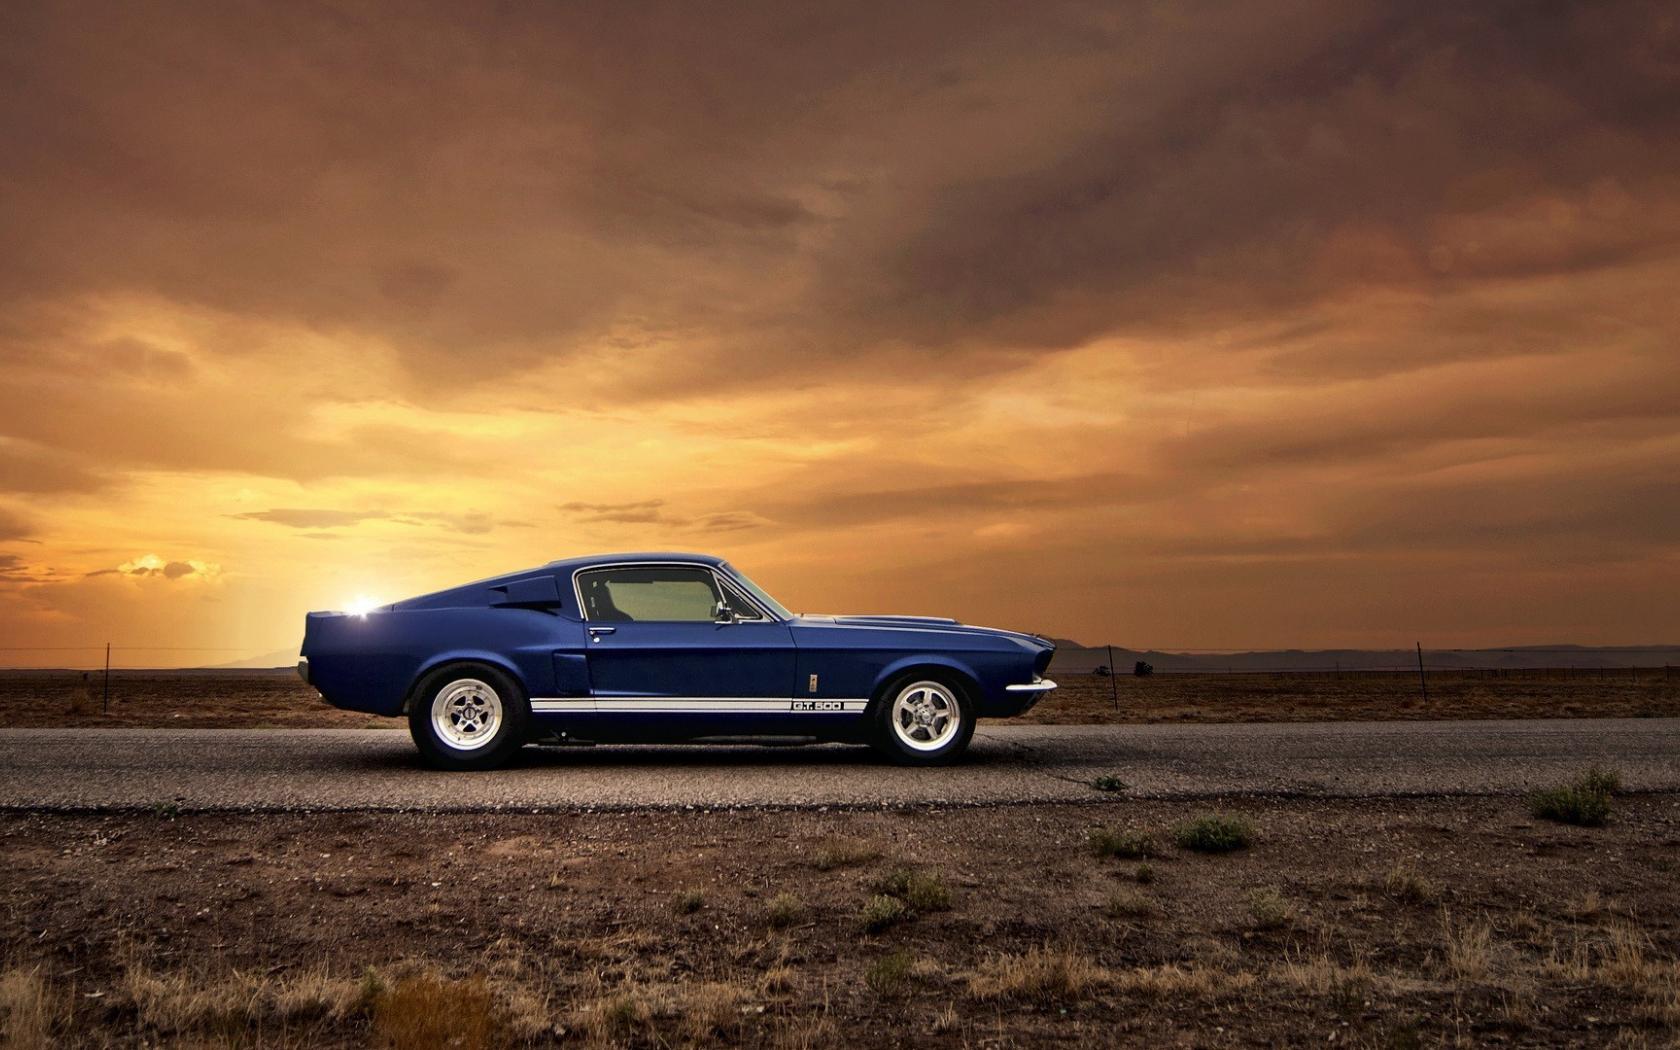 Download Muscle Car Wallpapers Archives Hd Desktop Wallpapers 4k Hd